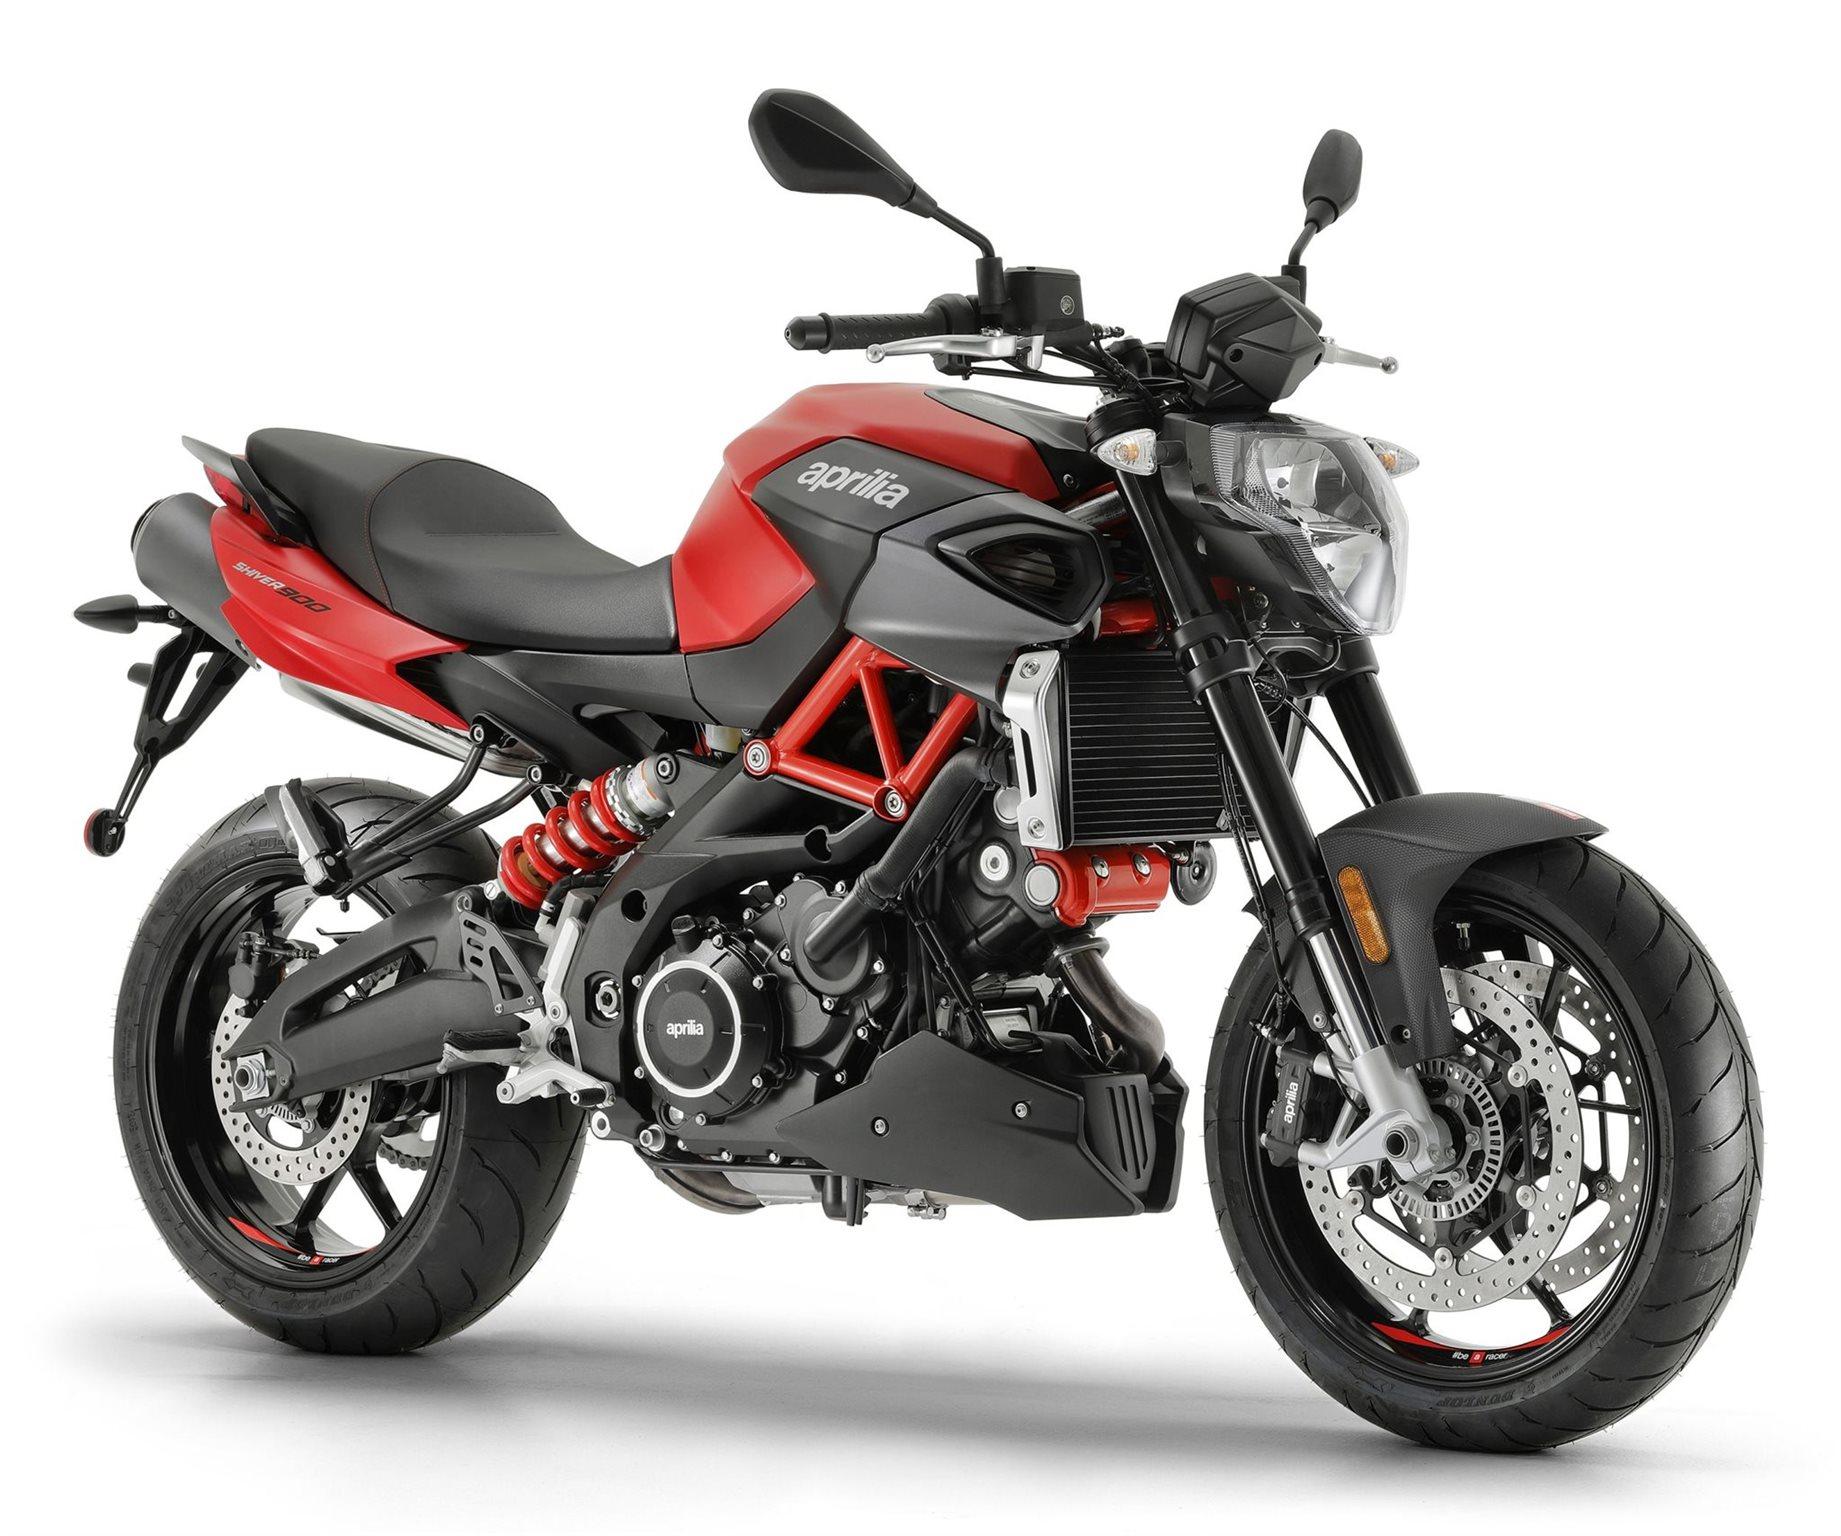 Aprilia Shiver 900 Motorrad, neu